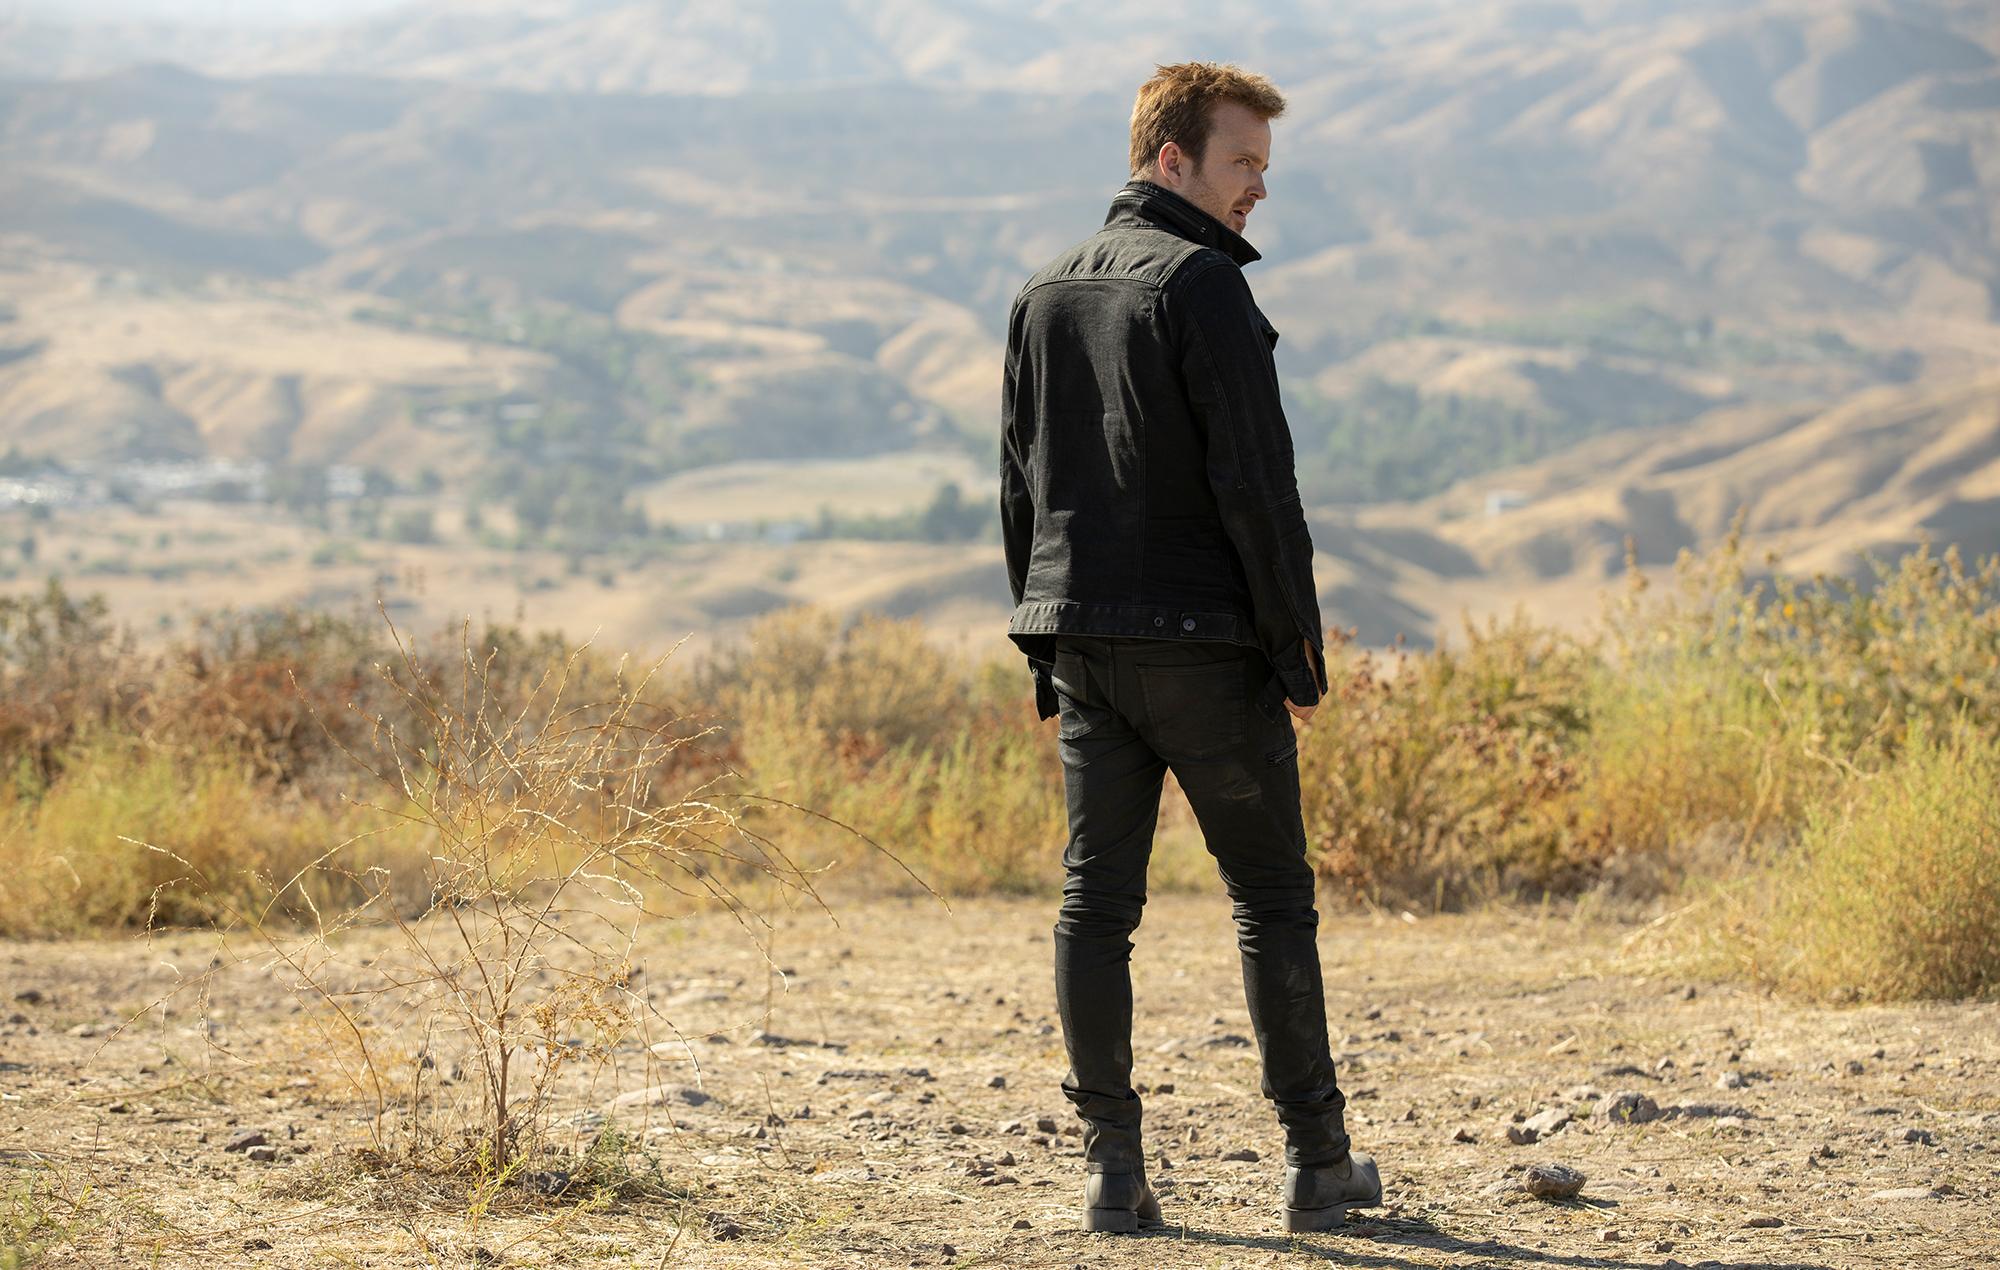 Westworld season 3 episode 7